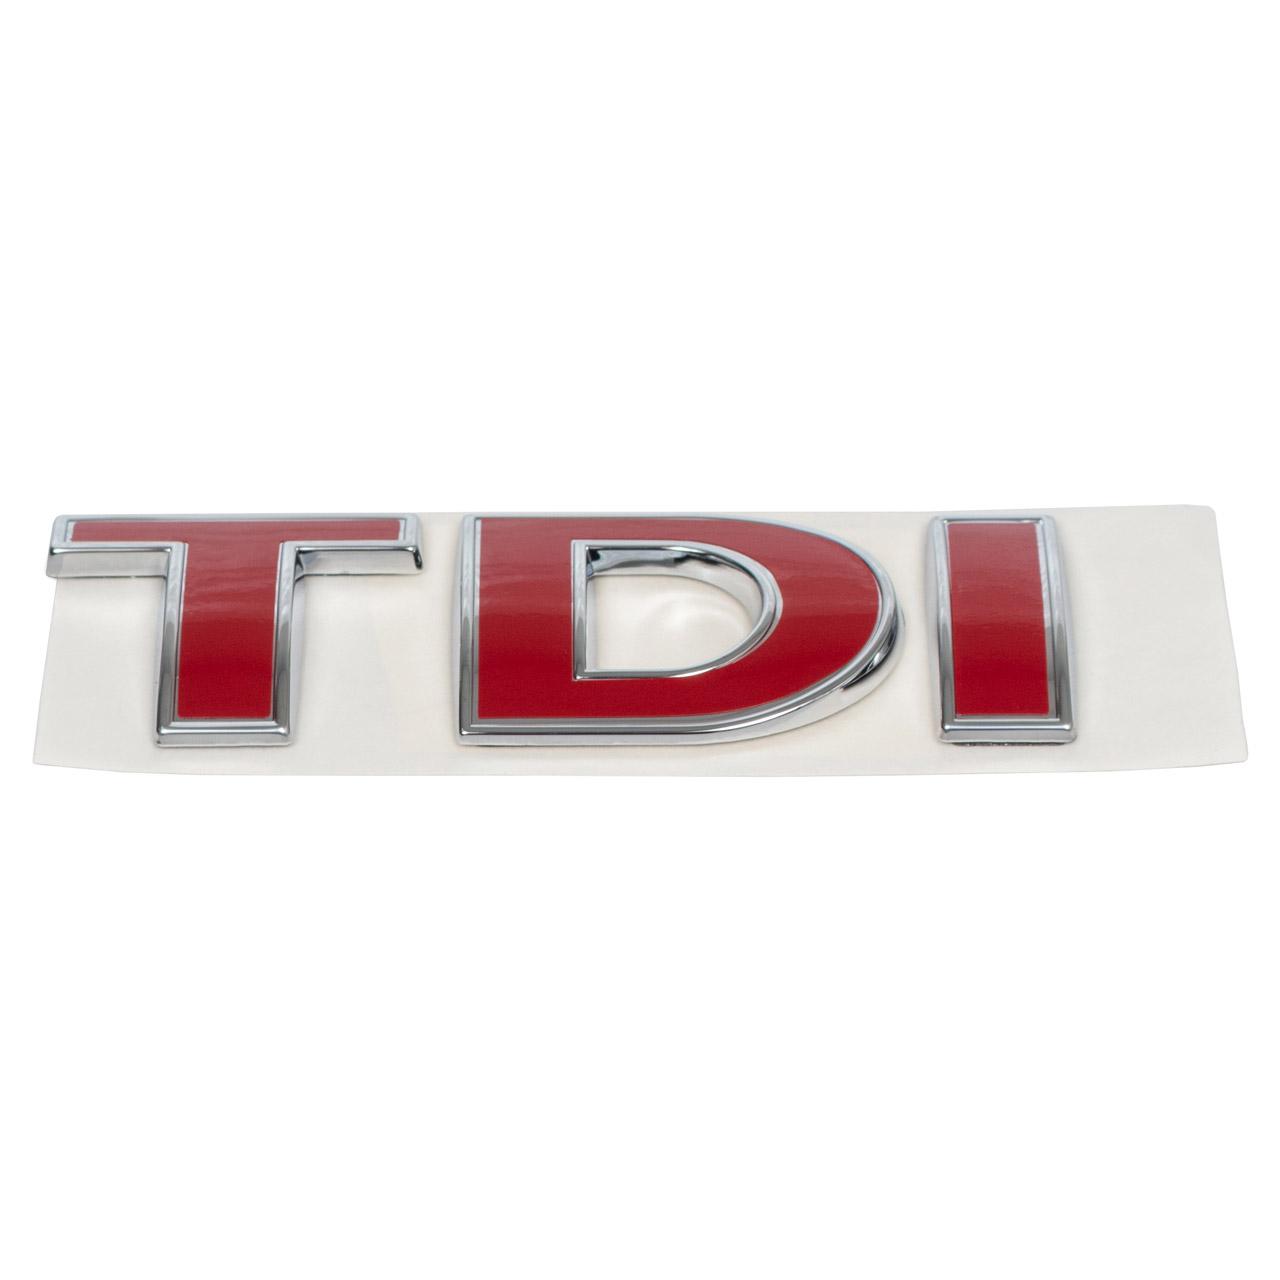 ORIGINAL VW Emblem Logo Schriftzug TDI Golf 4 Bora Passat 3B3 3B6 1J0853675ACGQF